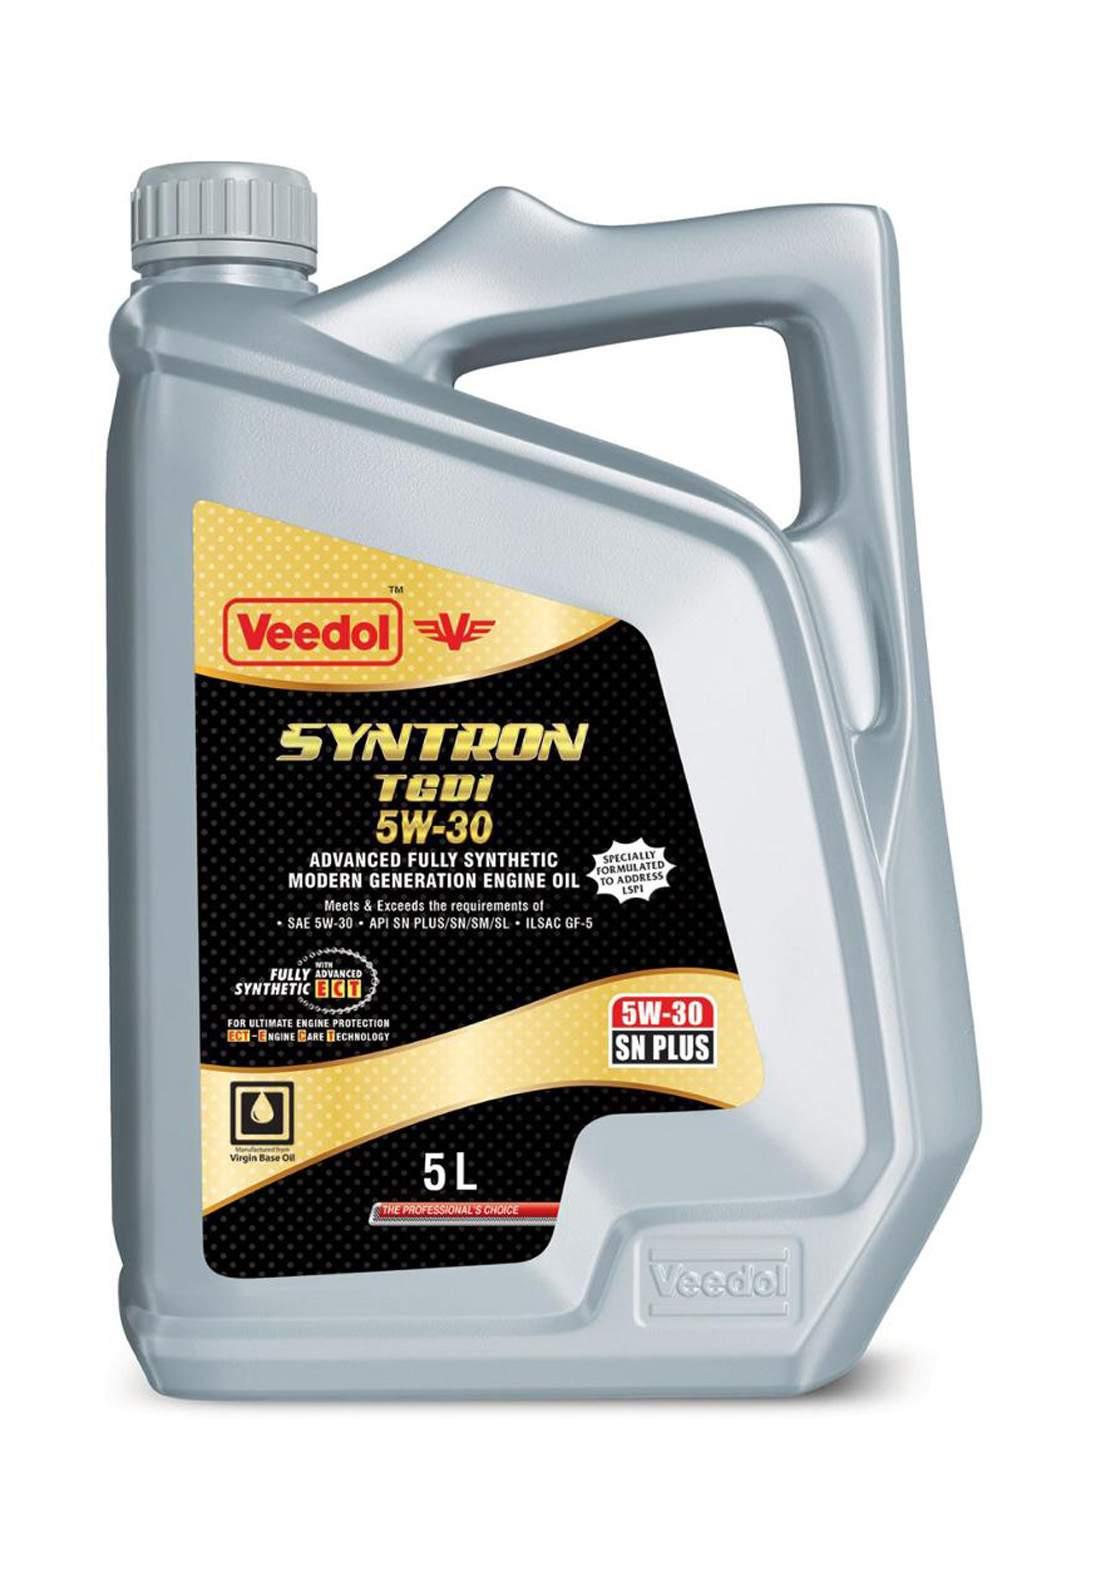 Veedol Syntron 73116U29P00 5W30 Engine Oil SN+ -GF-5 5 L زيت محرك السيارة